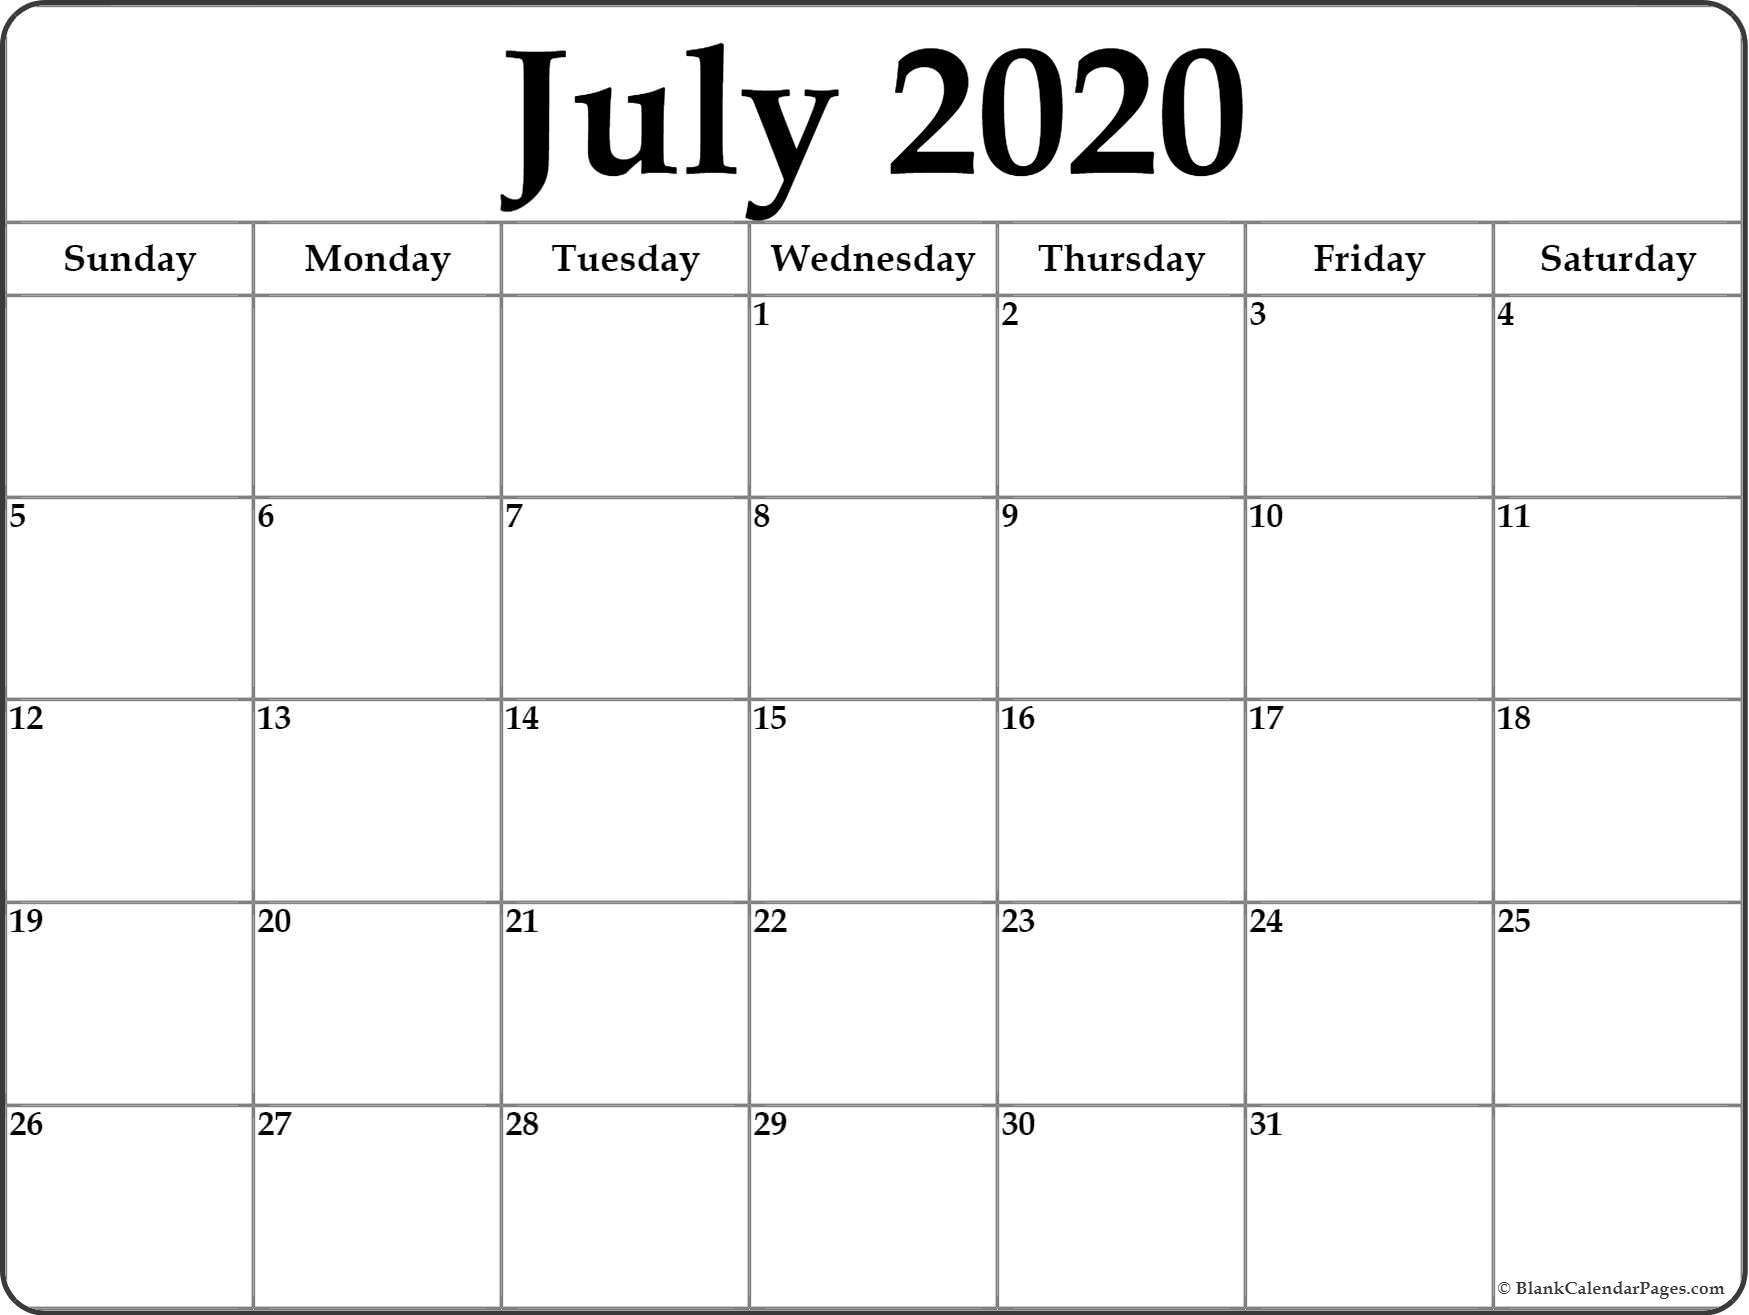 July 2020 Calendar   Free Printable Monthly Calendars